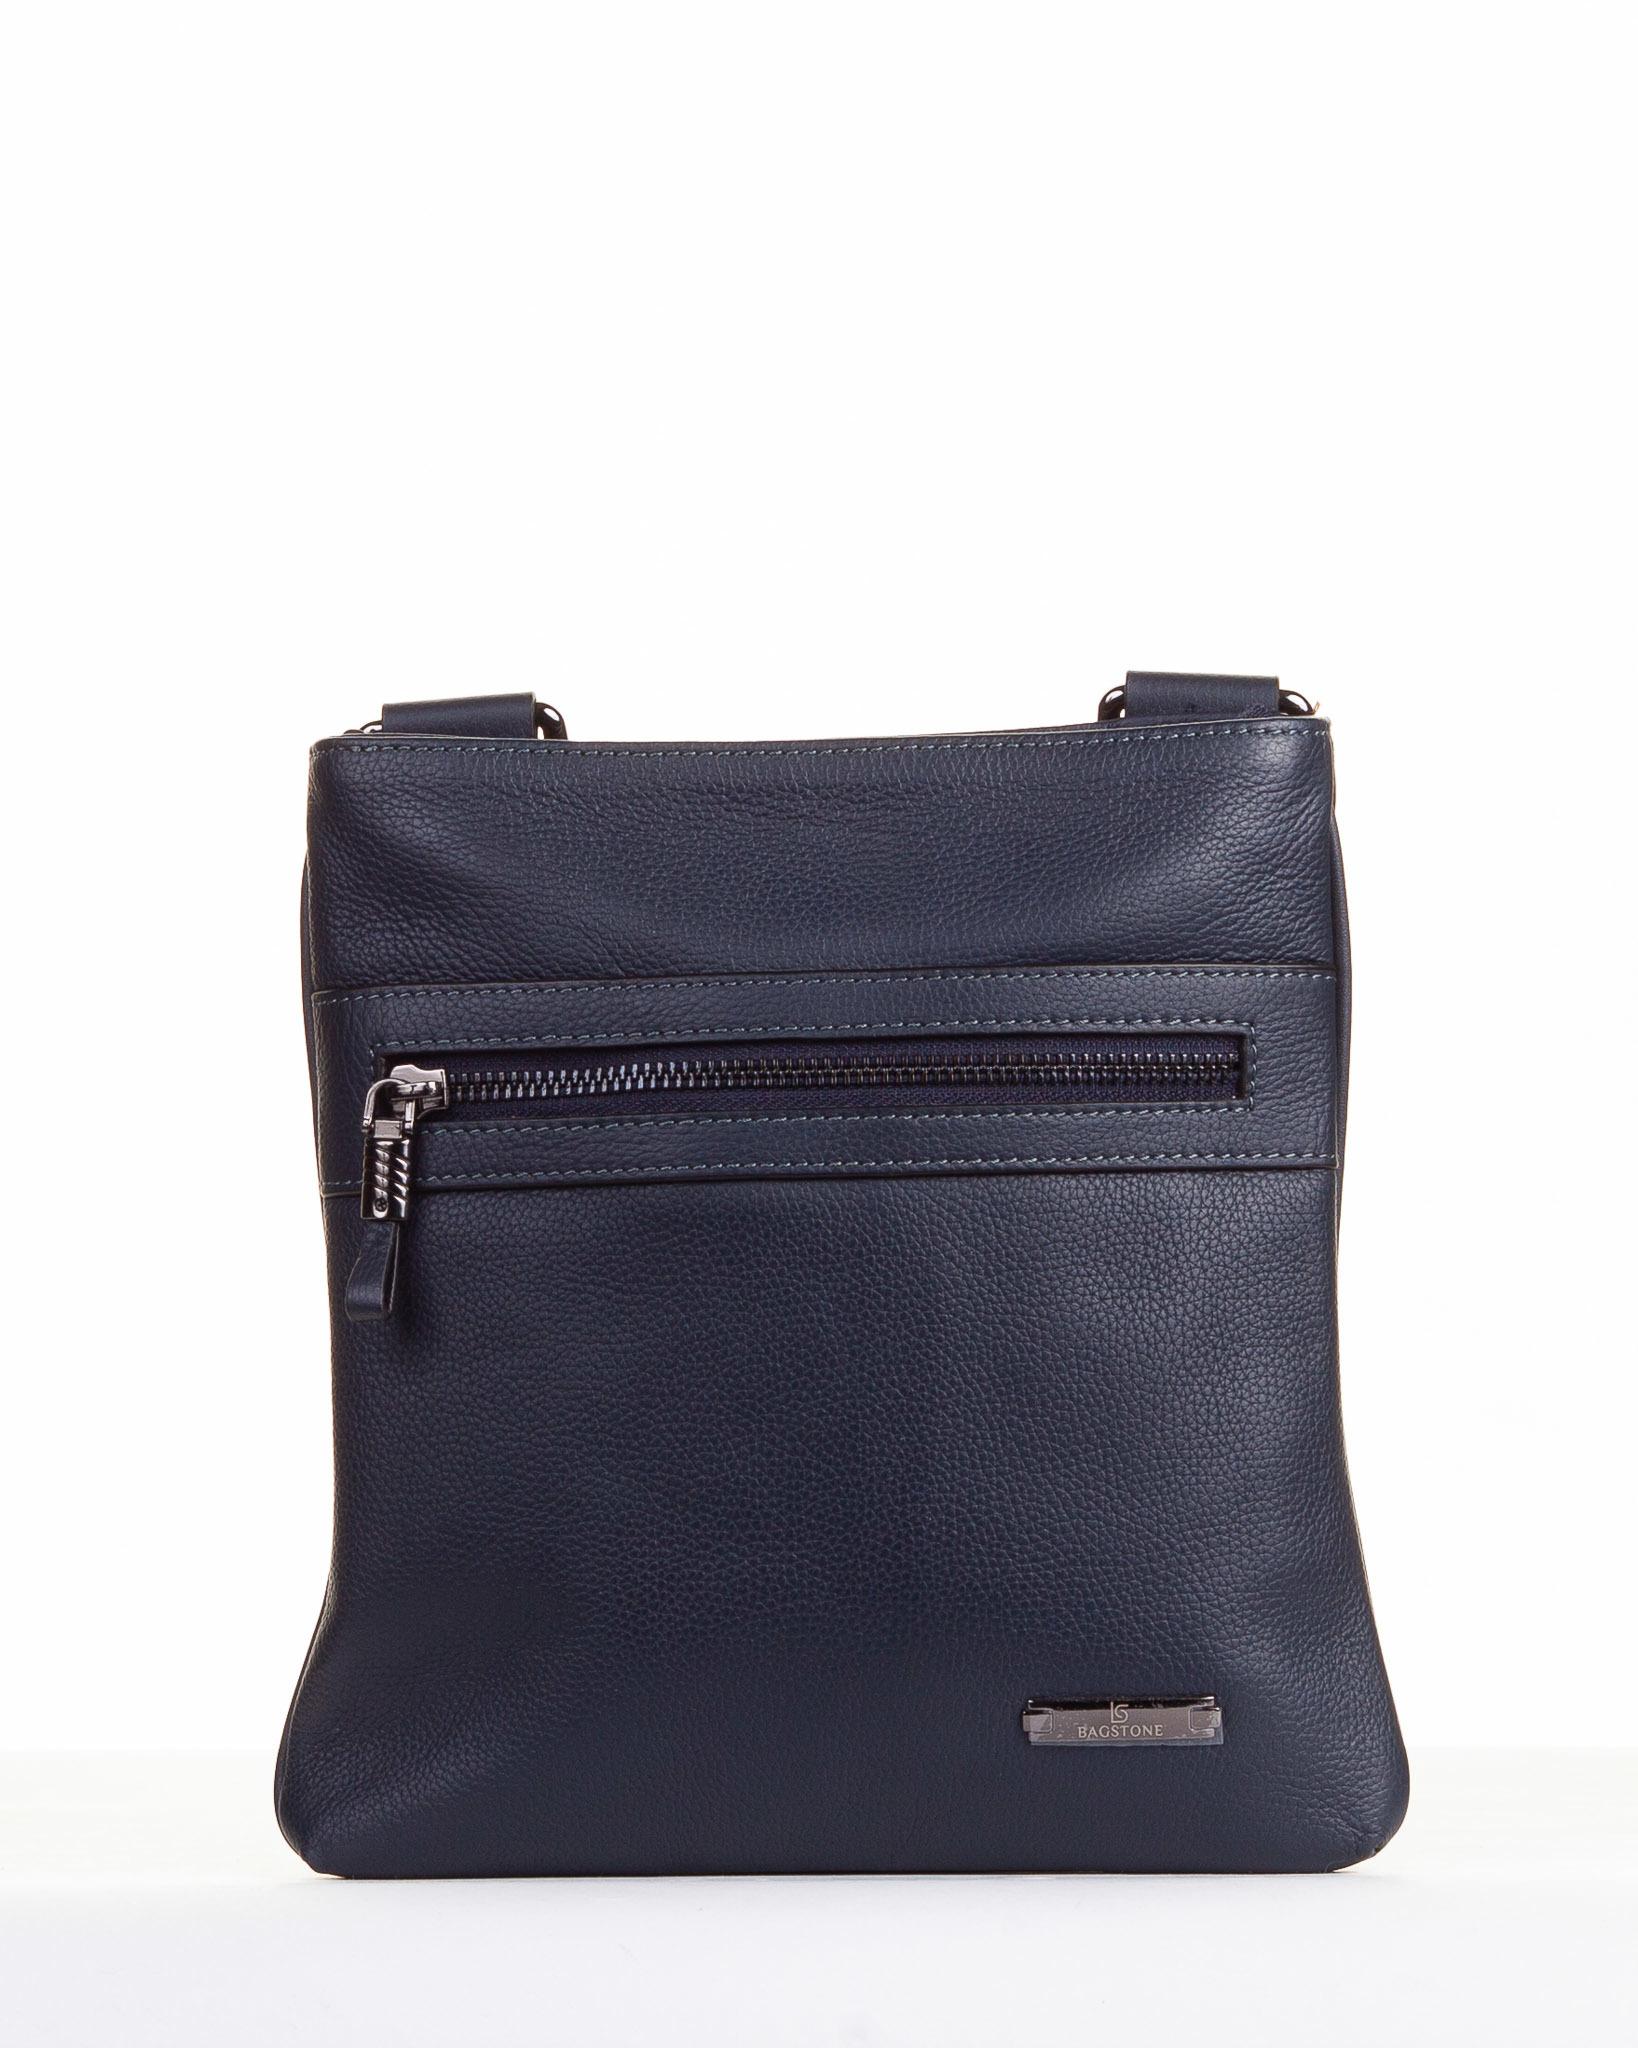 TABRIANO сумка мужская